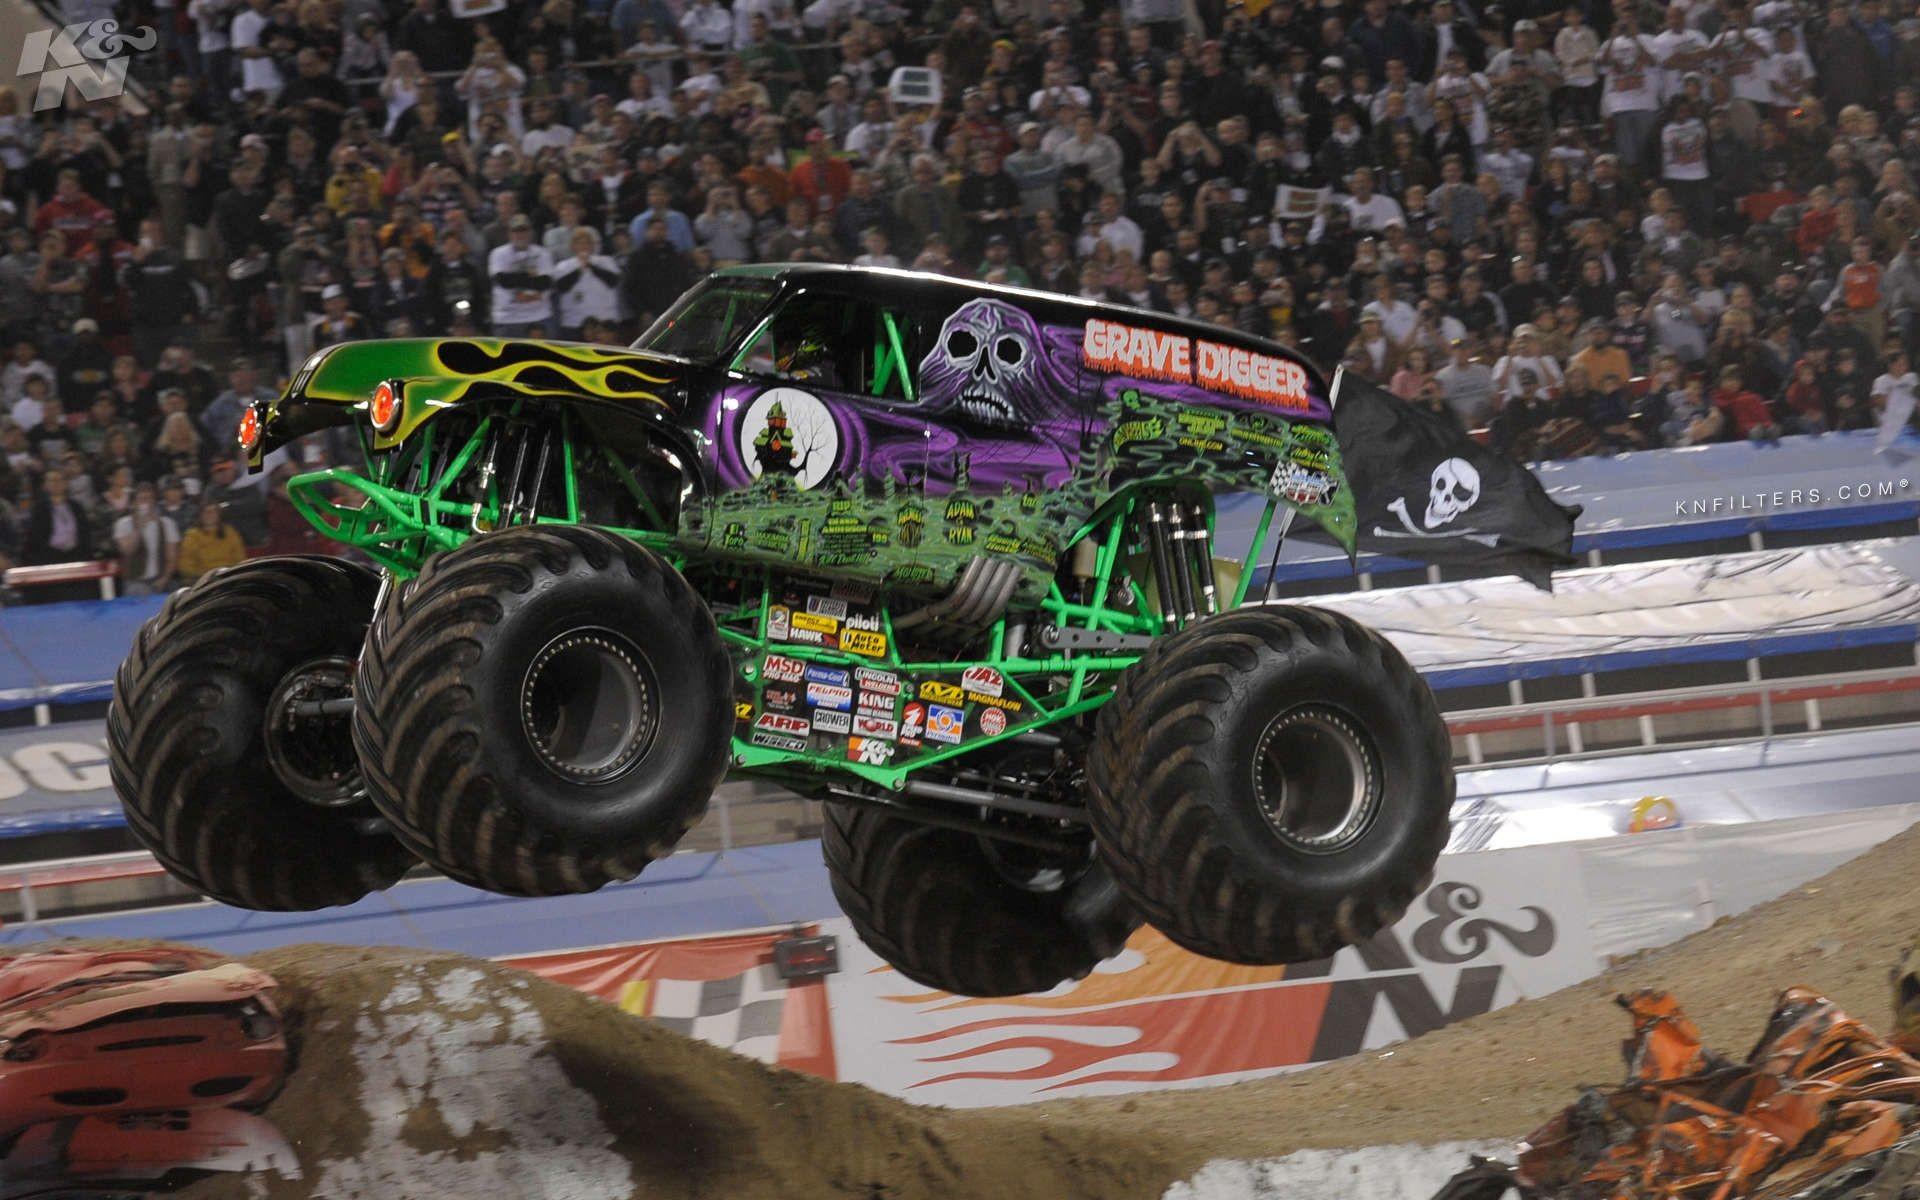 Res: 1920x1200, monster truck wallpaper desktop - http://hdwallpaper.info/monster-truck- wallpaper-desktop/ HD Wallpapers